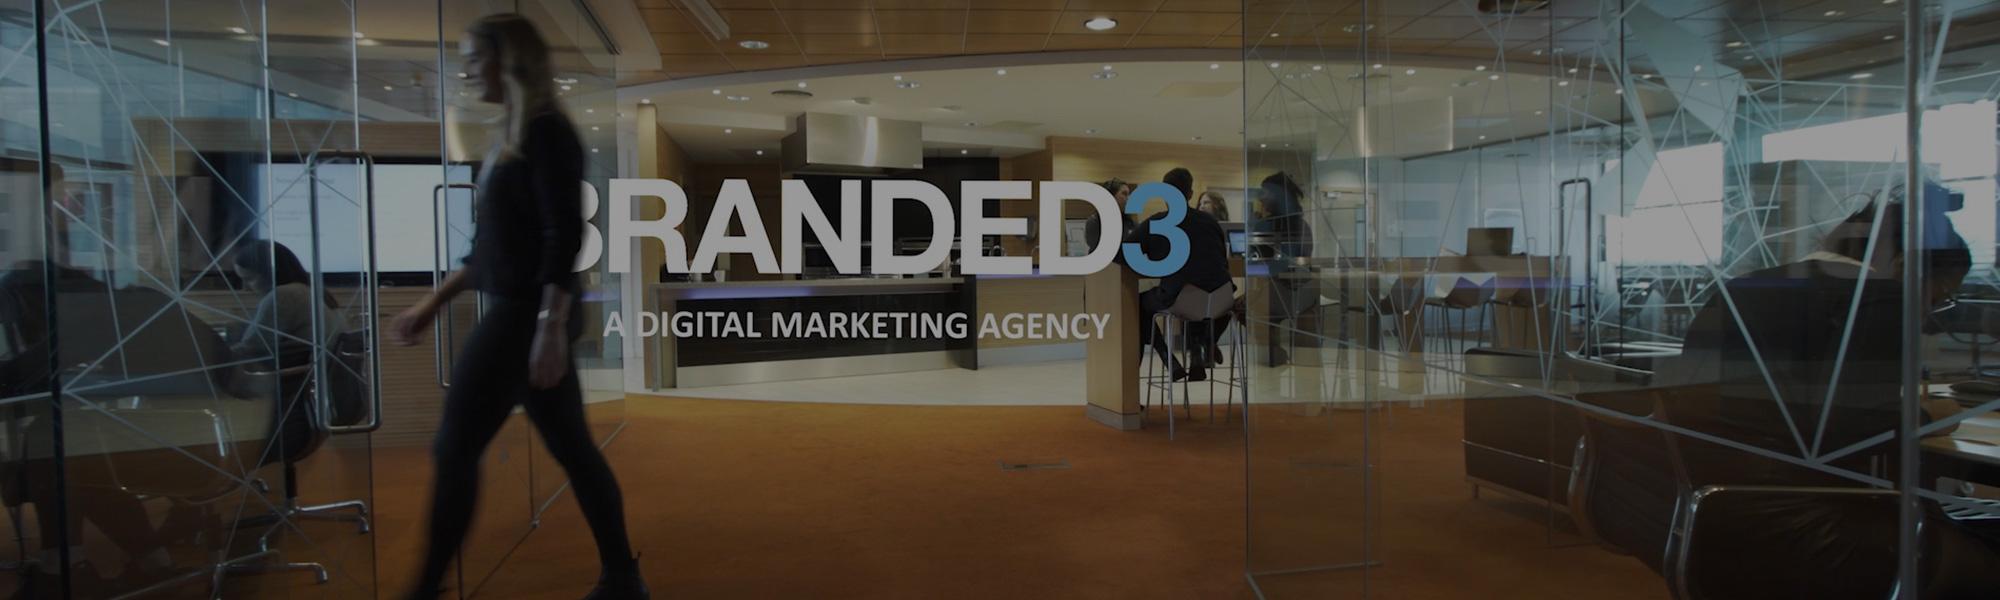 Branded3 – Company film